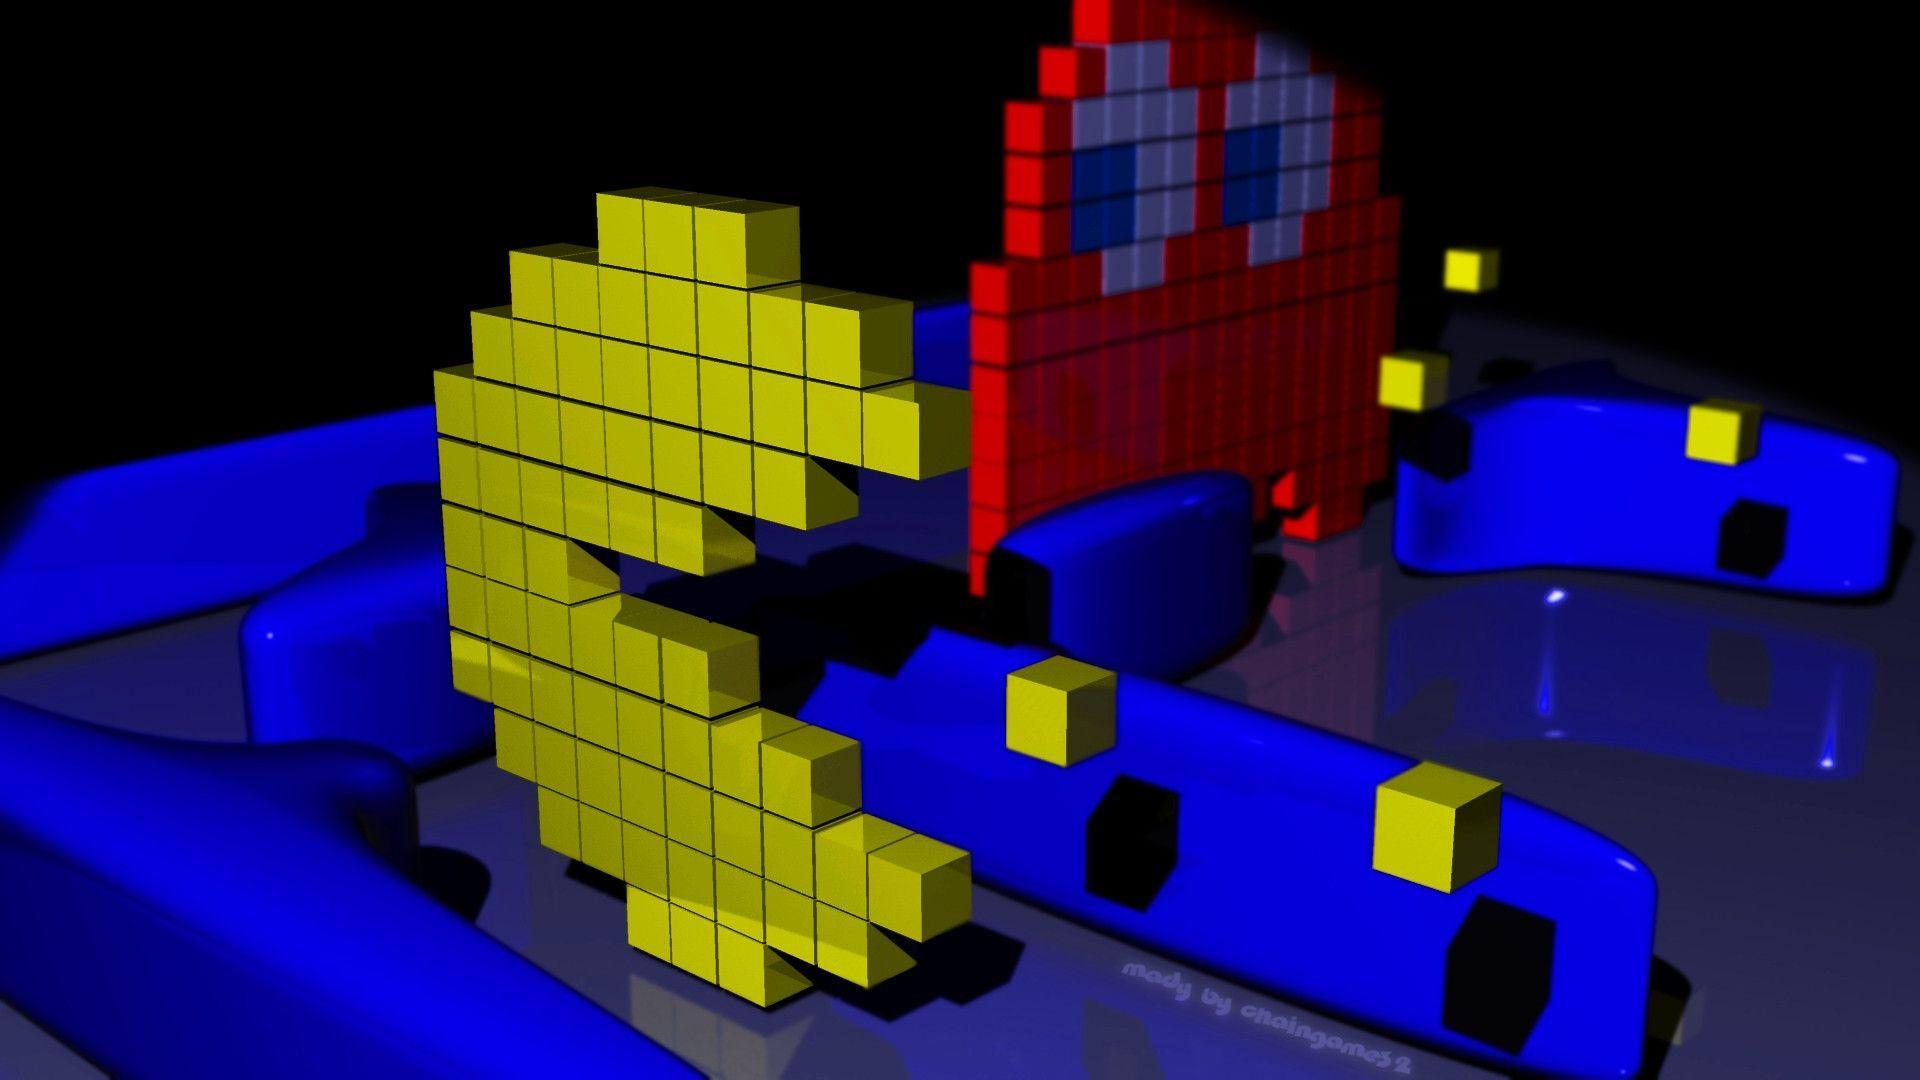 Pacman Deviantart 2019: Pacman Wallpapers